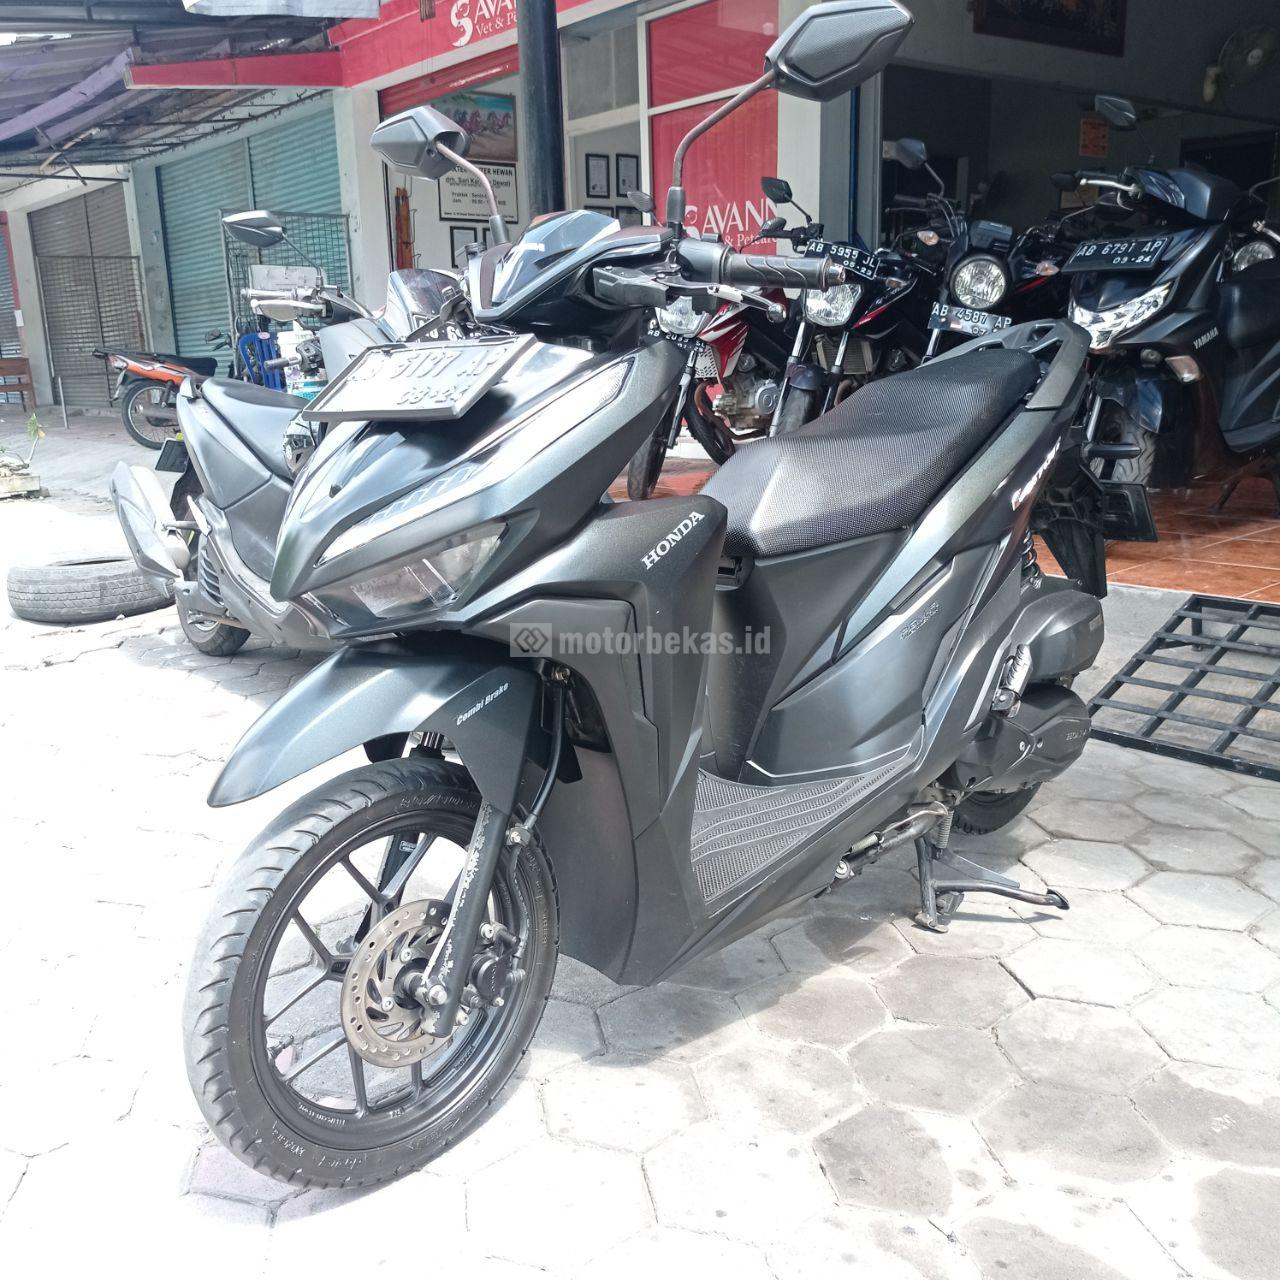 HONDA VARIO 125  524 motorbekas.id